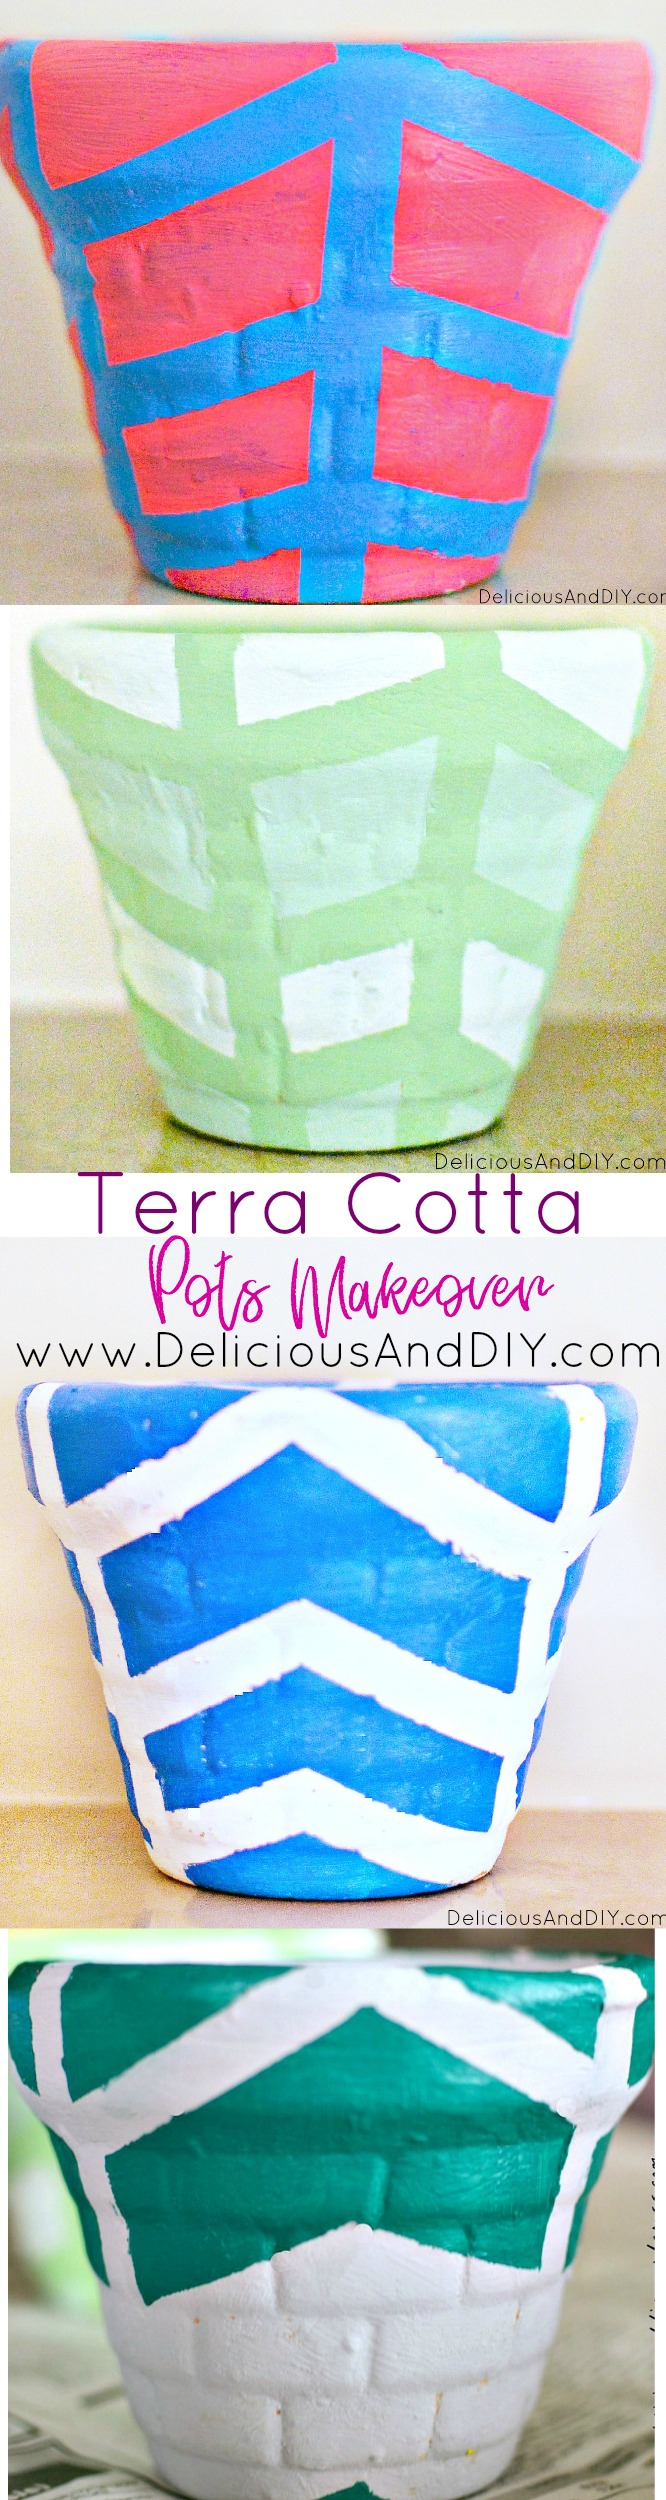 Terra Cotta Pots Makeover using masking tape| Bright colored Pots| Earthen Vase Makeover| DIY Crafts| Painted Pots| DIY Crafts| Handpainted Terra Cotta Pots| Bowl Makeover Projects